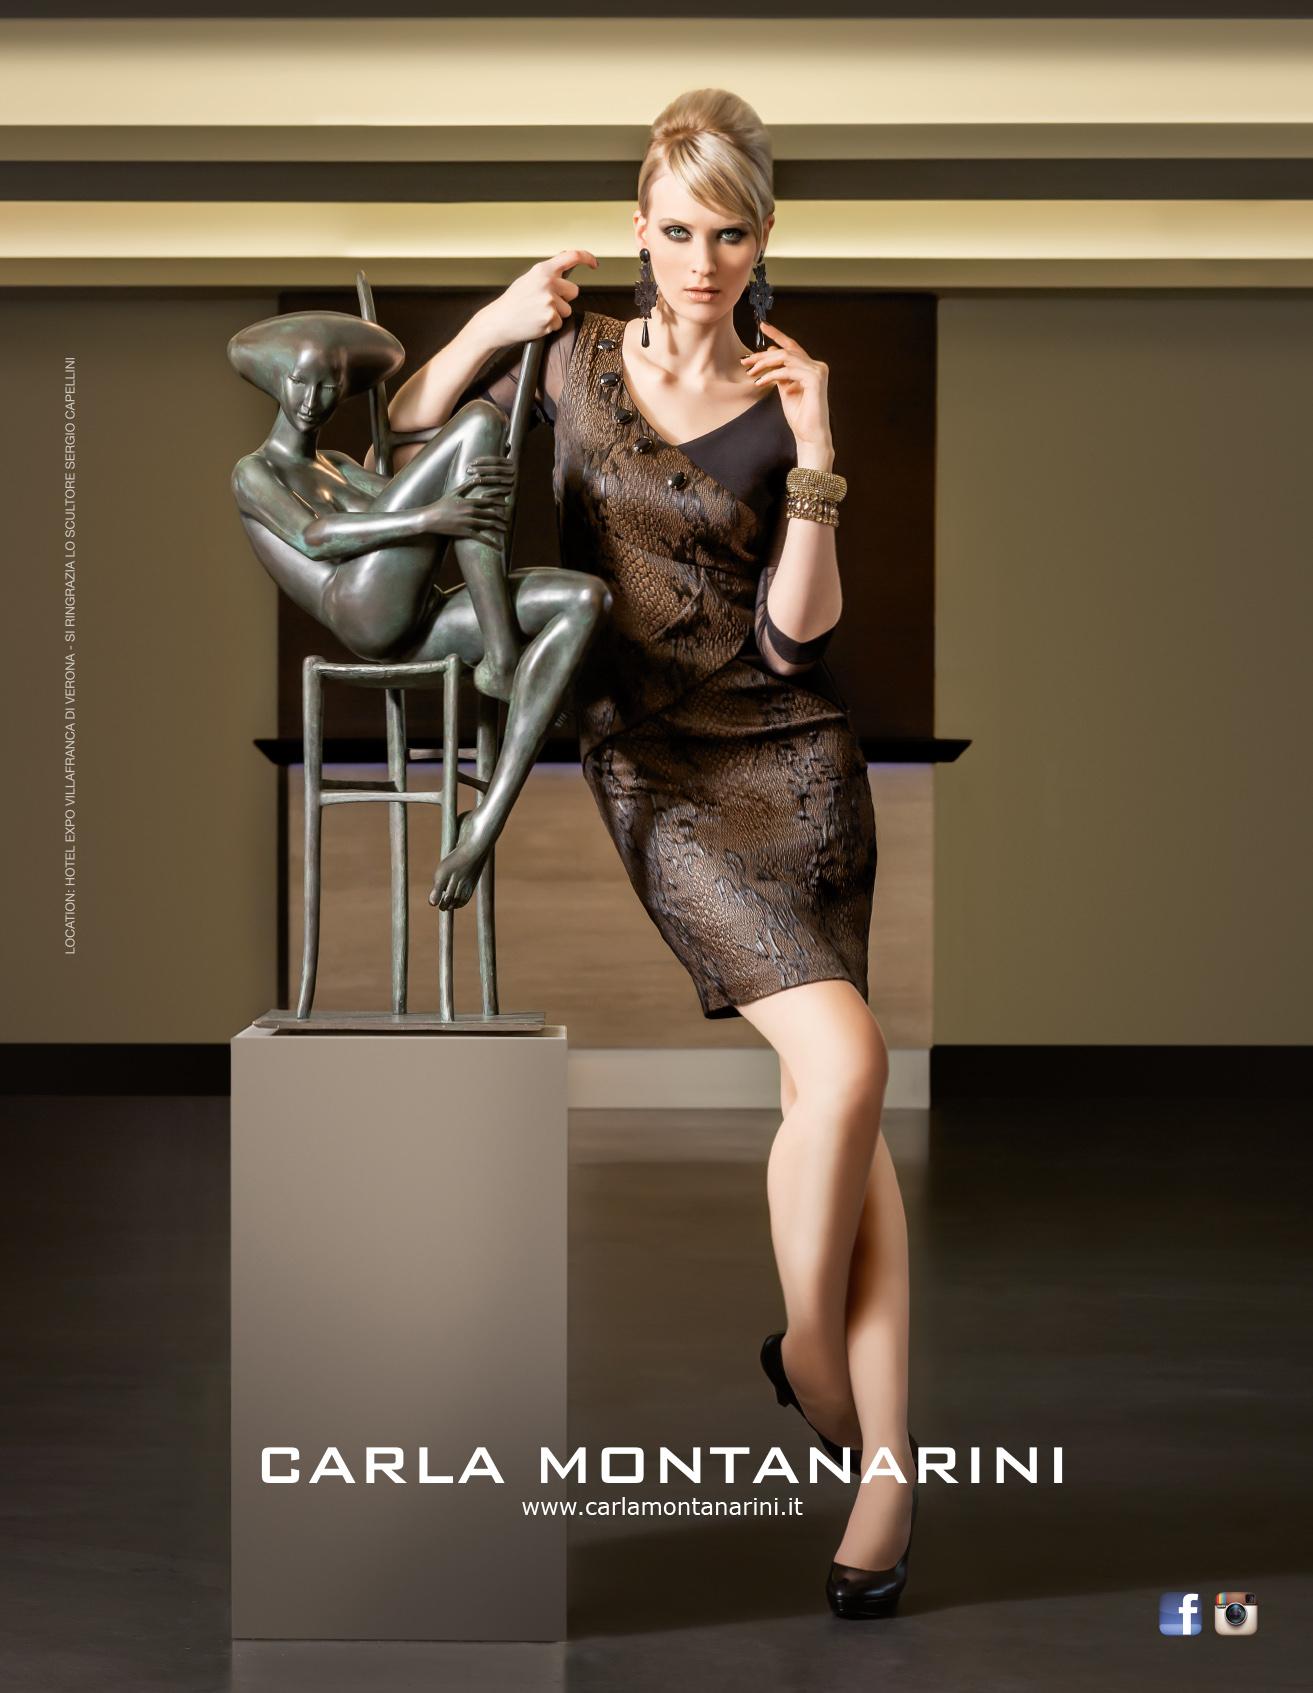 Carla montanarini ago14